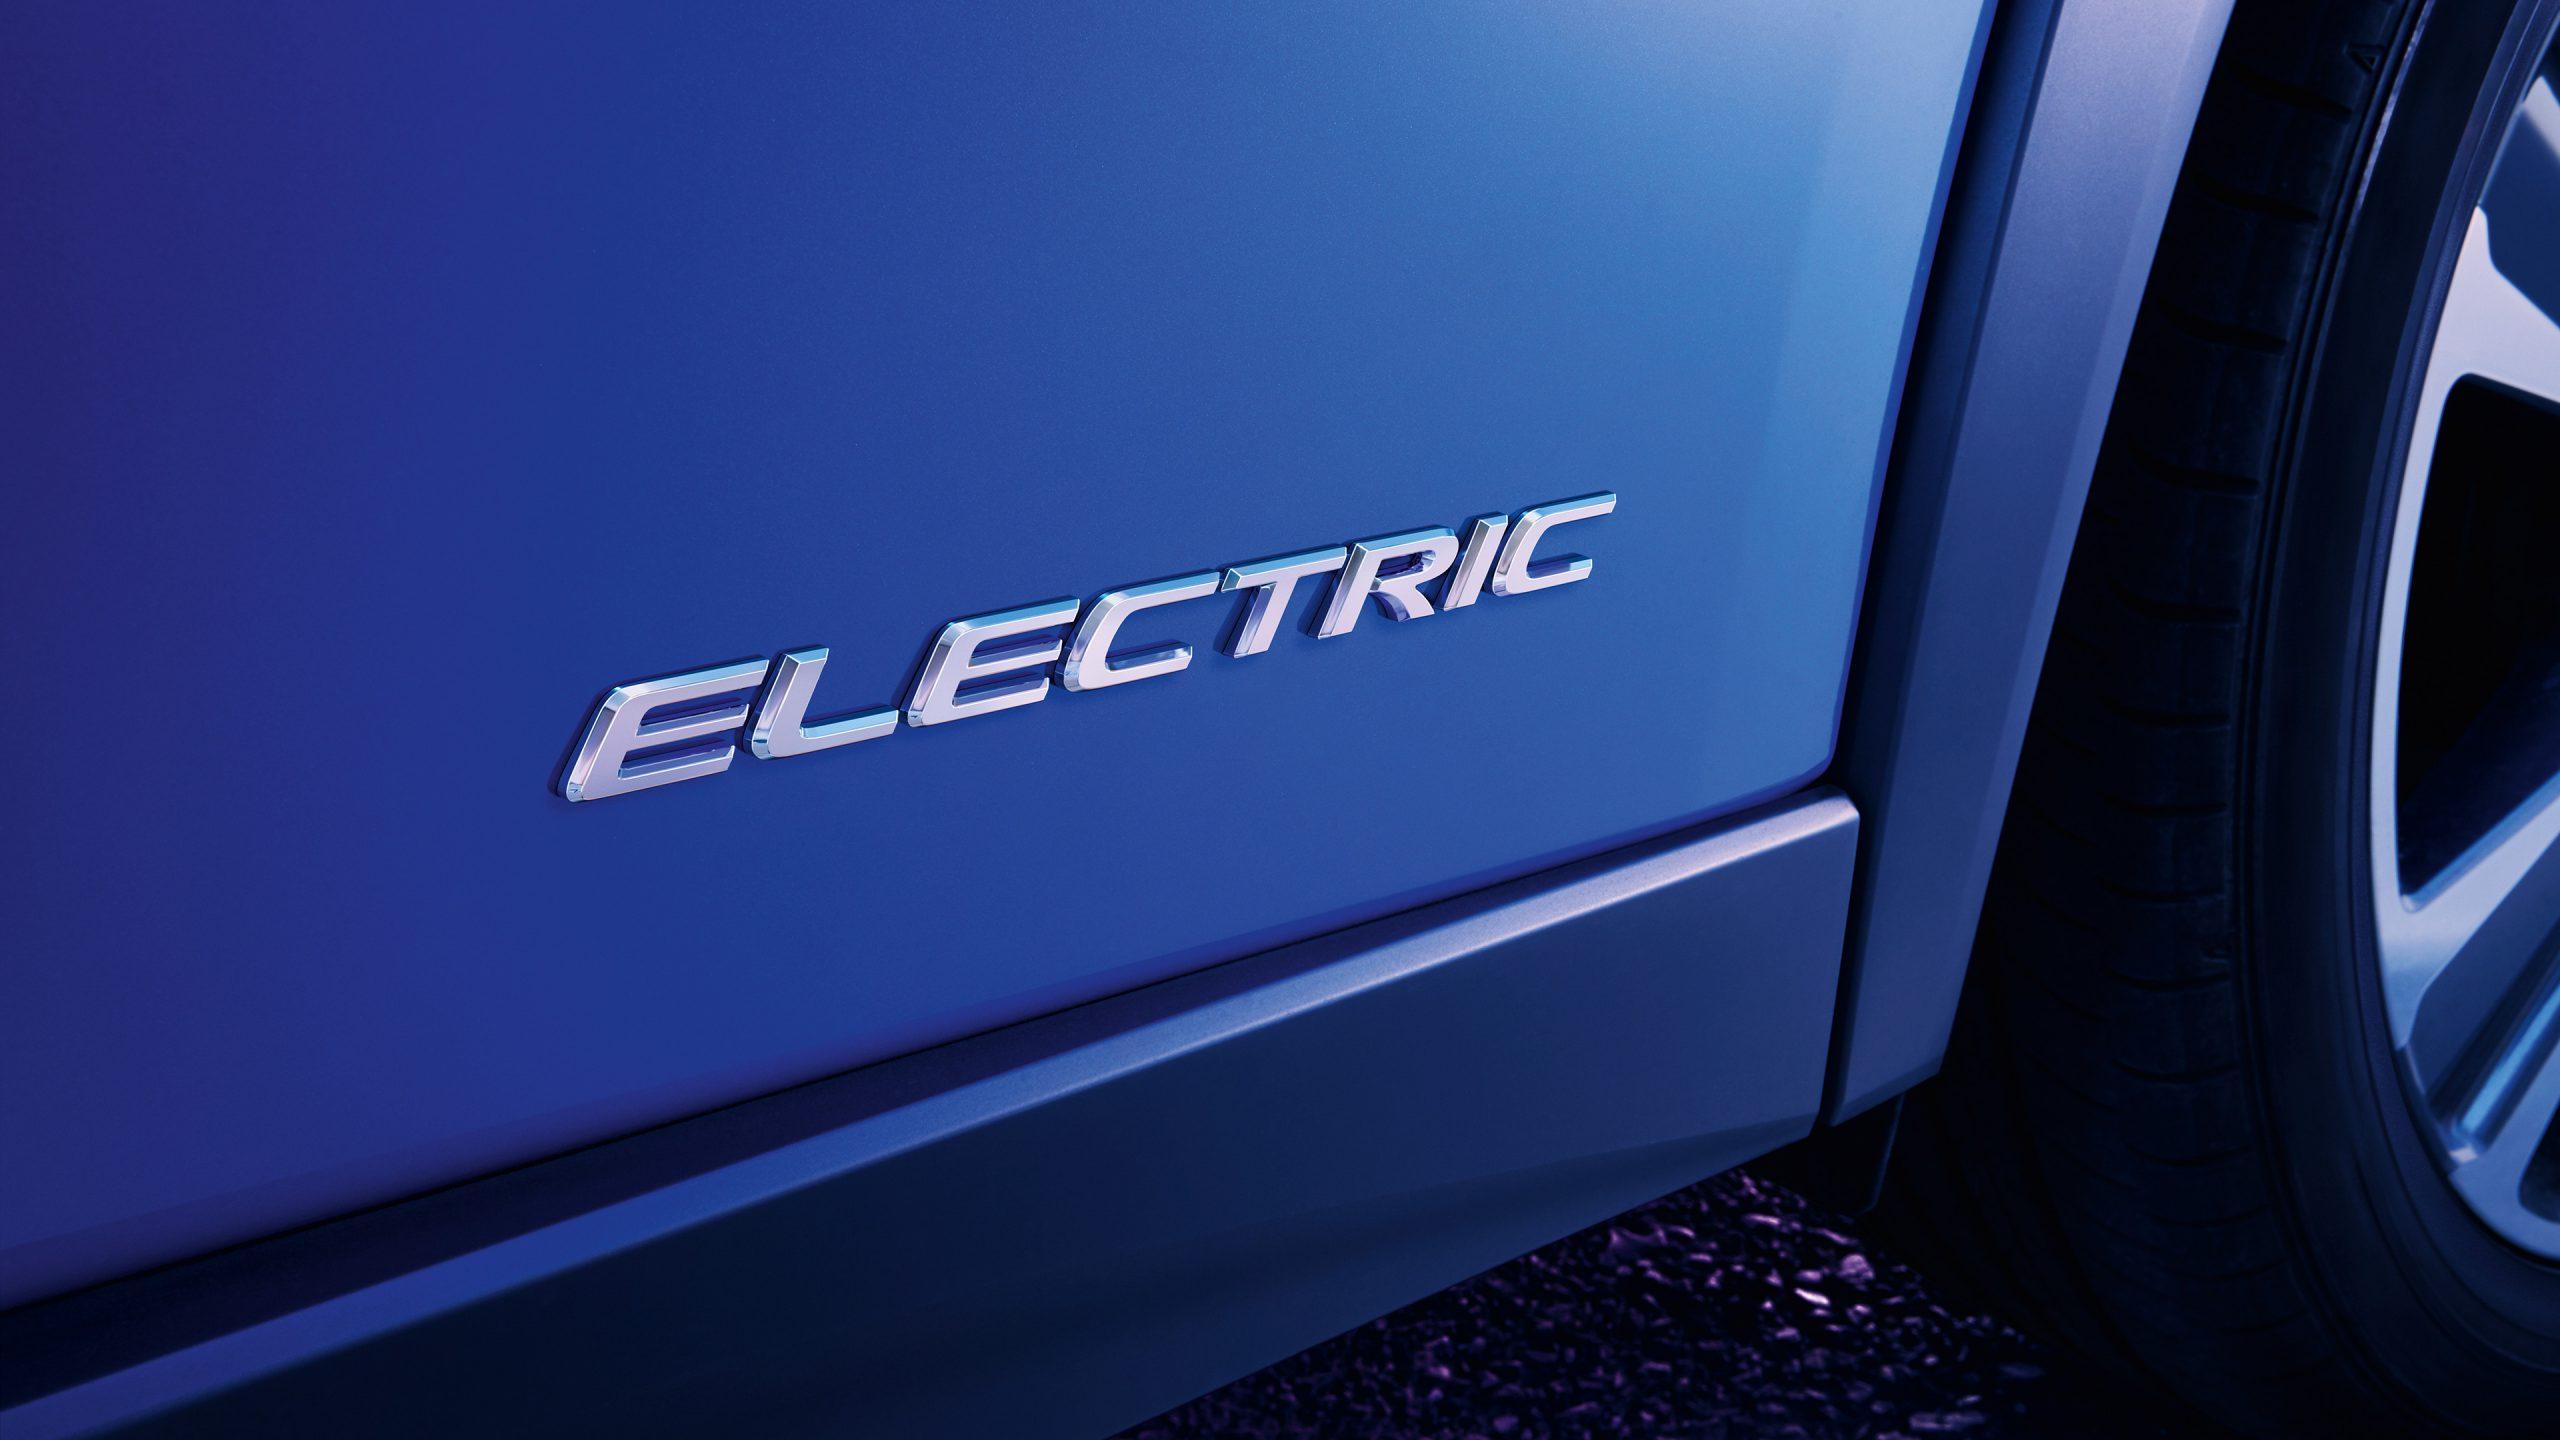 Lexus UX300e ELECTRIC detail scaled - Lexus UX 300e med Mark Levinson lydanlegg